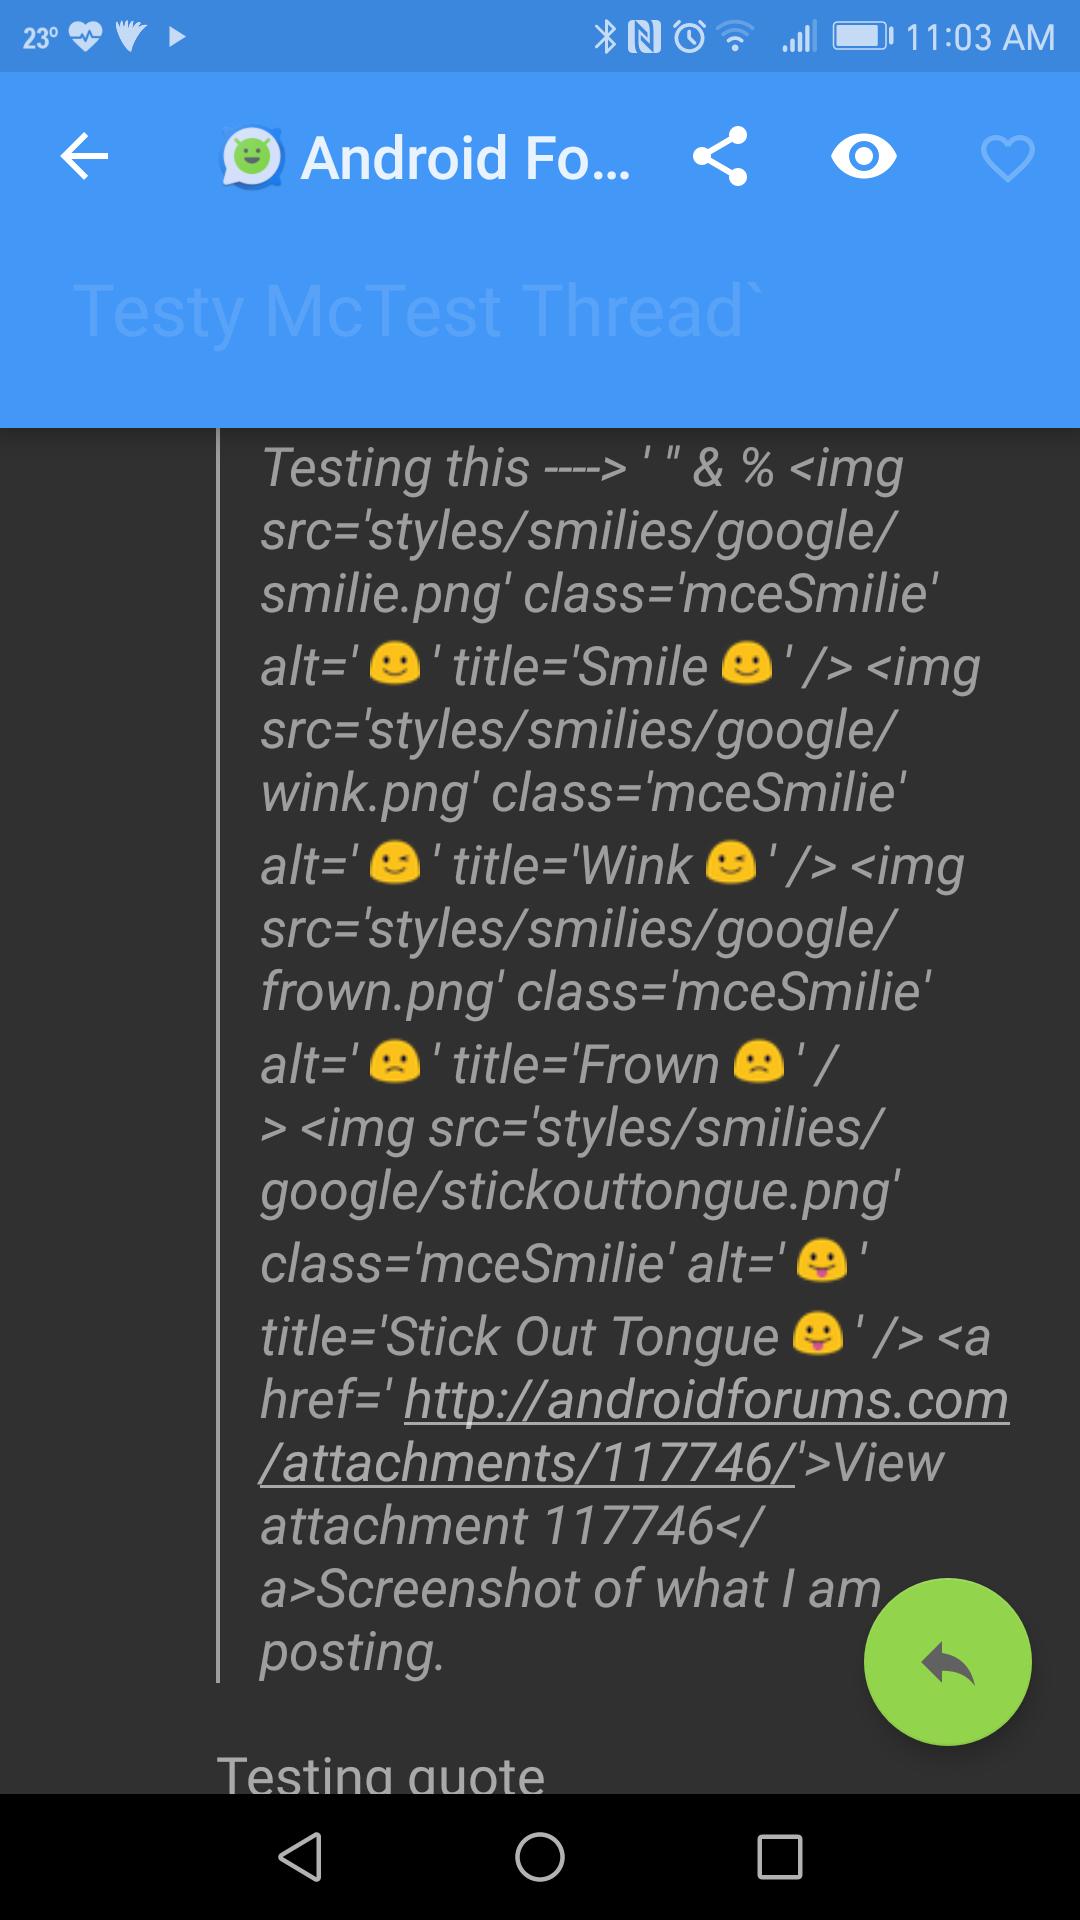 Screenshot_20170316-110335.png